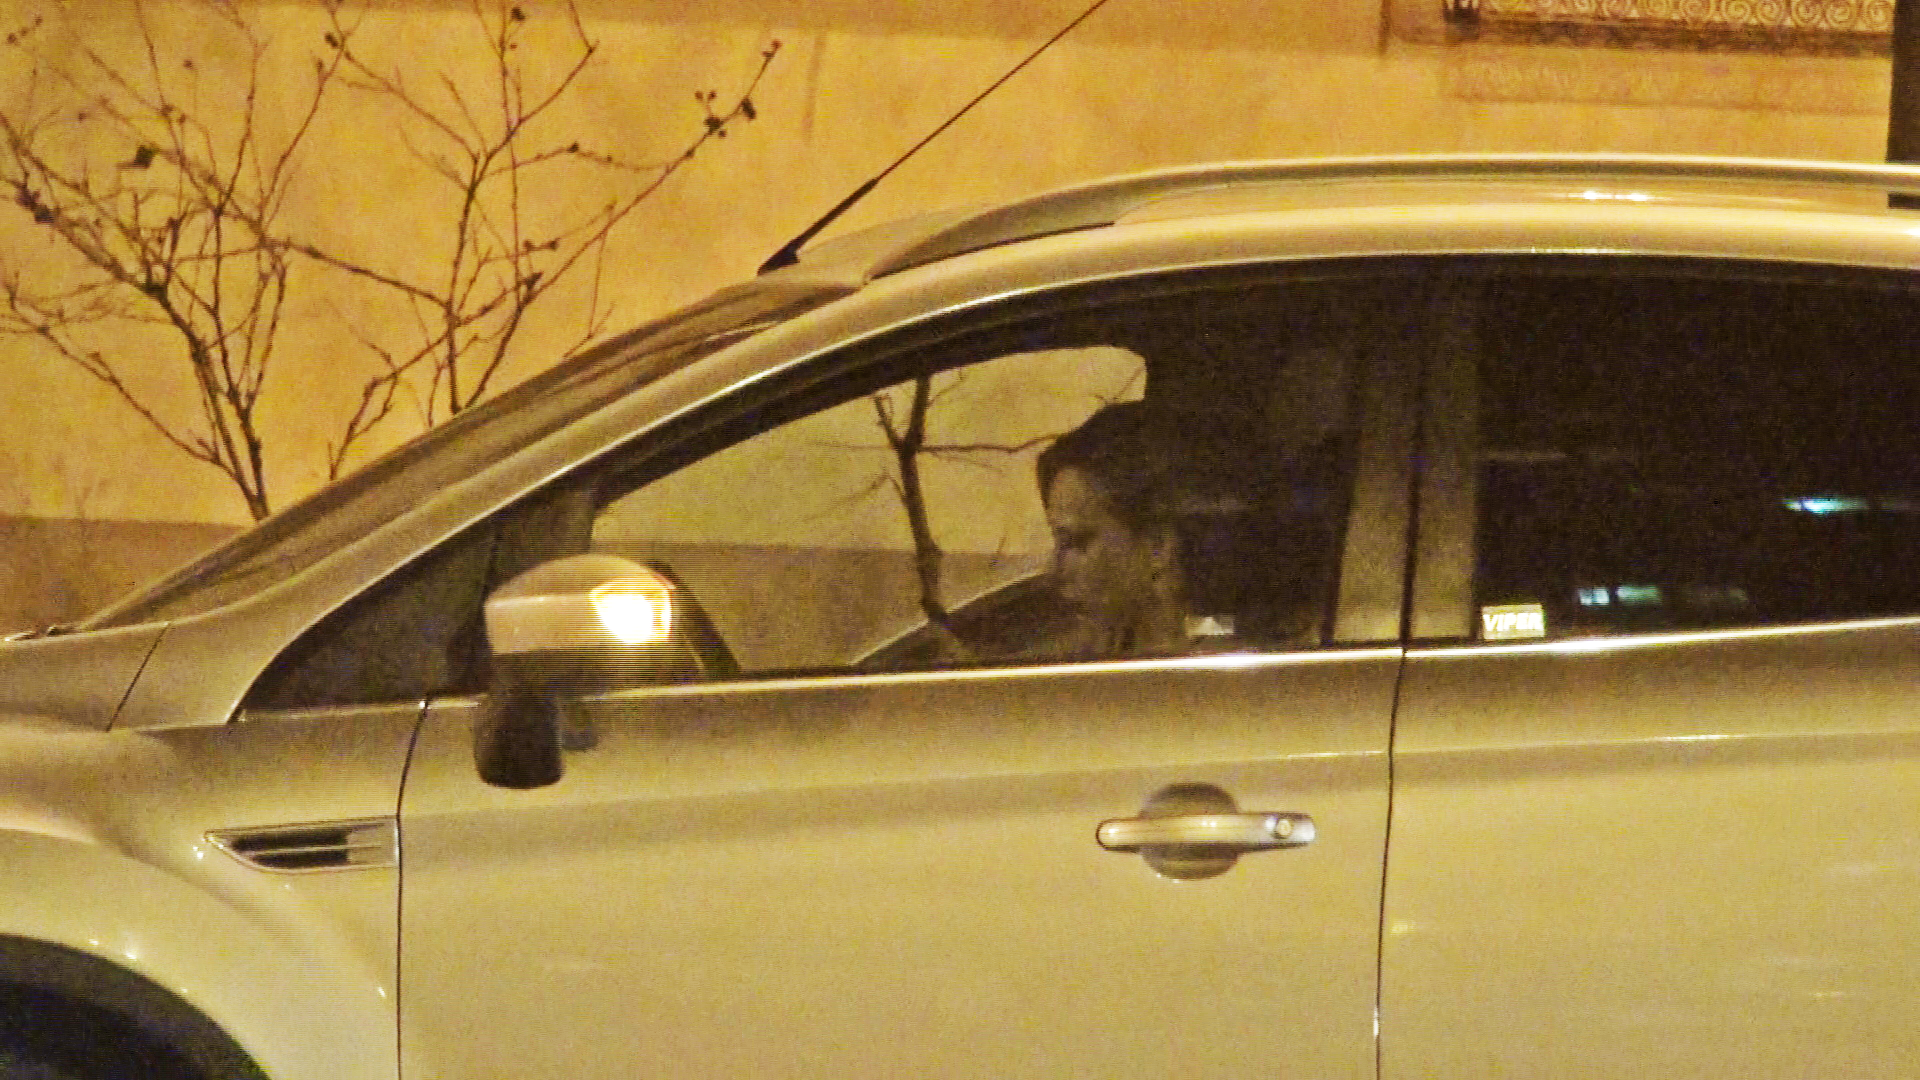 Iulia a stat 30 de minute in masina, iar la un moment dat a inceput sa scrie mesaje pe telefonul mobil